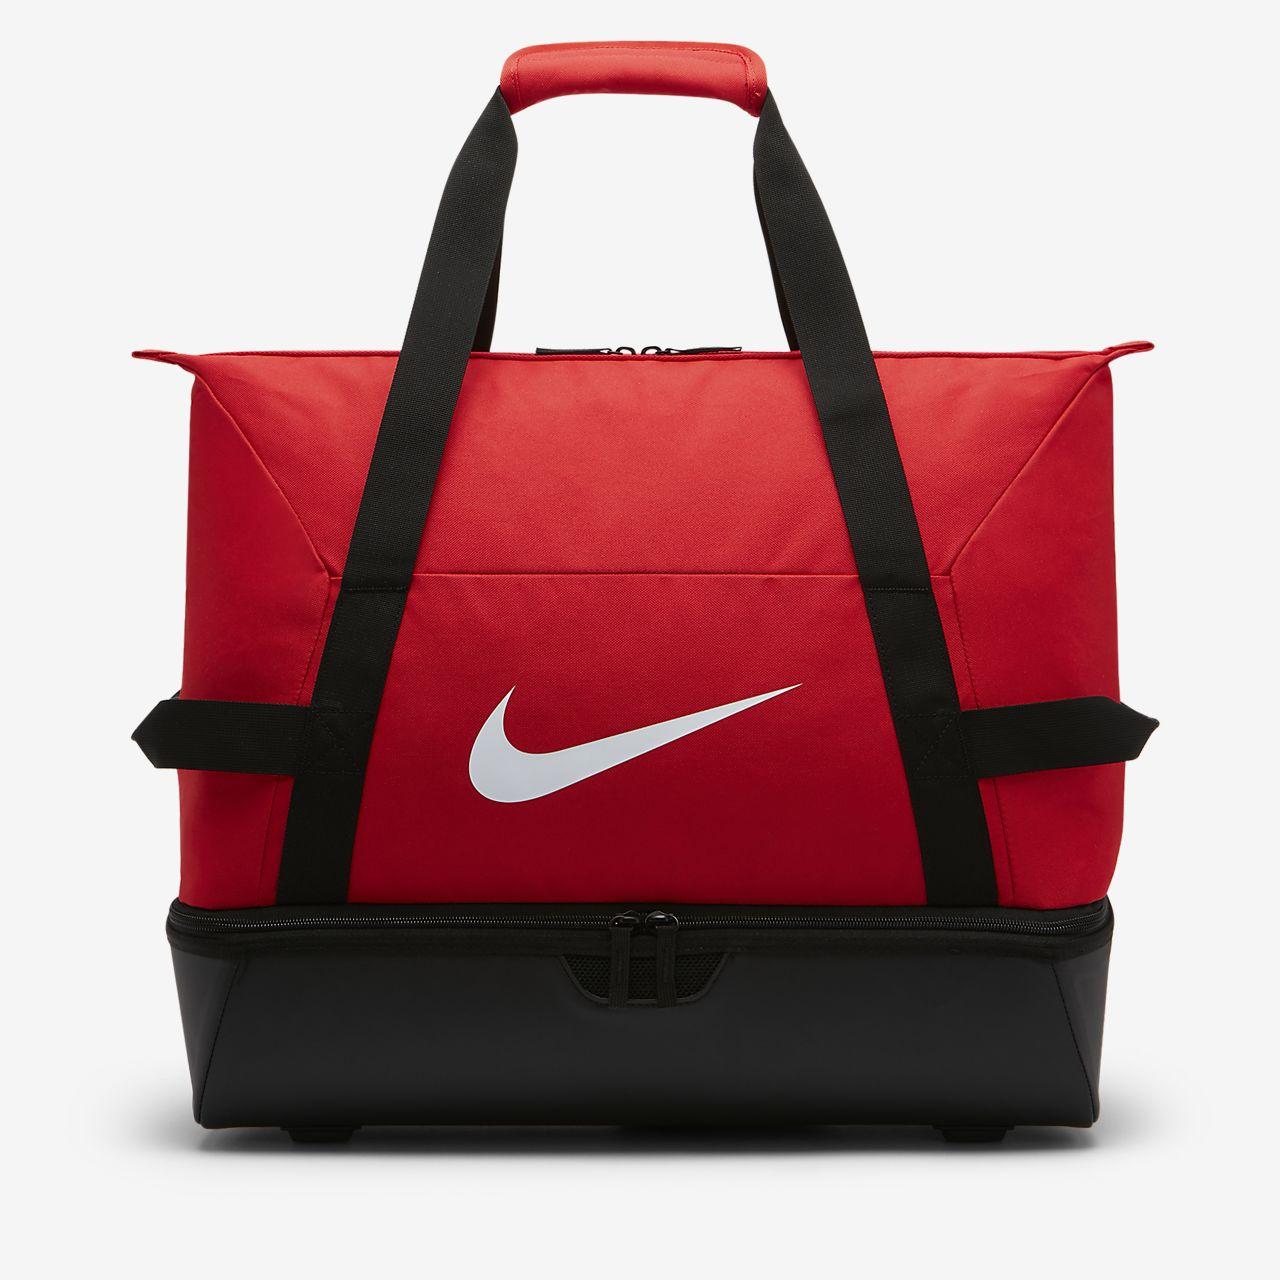 Nike Academy Team Hardcase-fodboldsportstaske (stor)